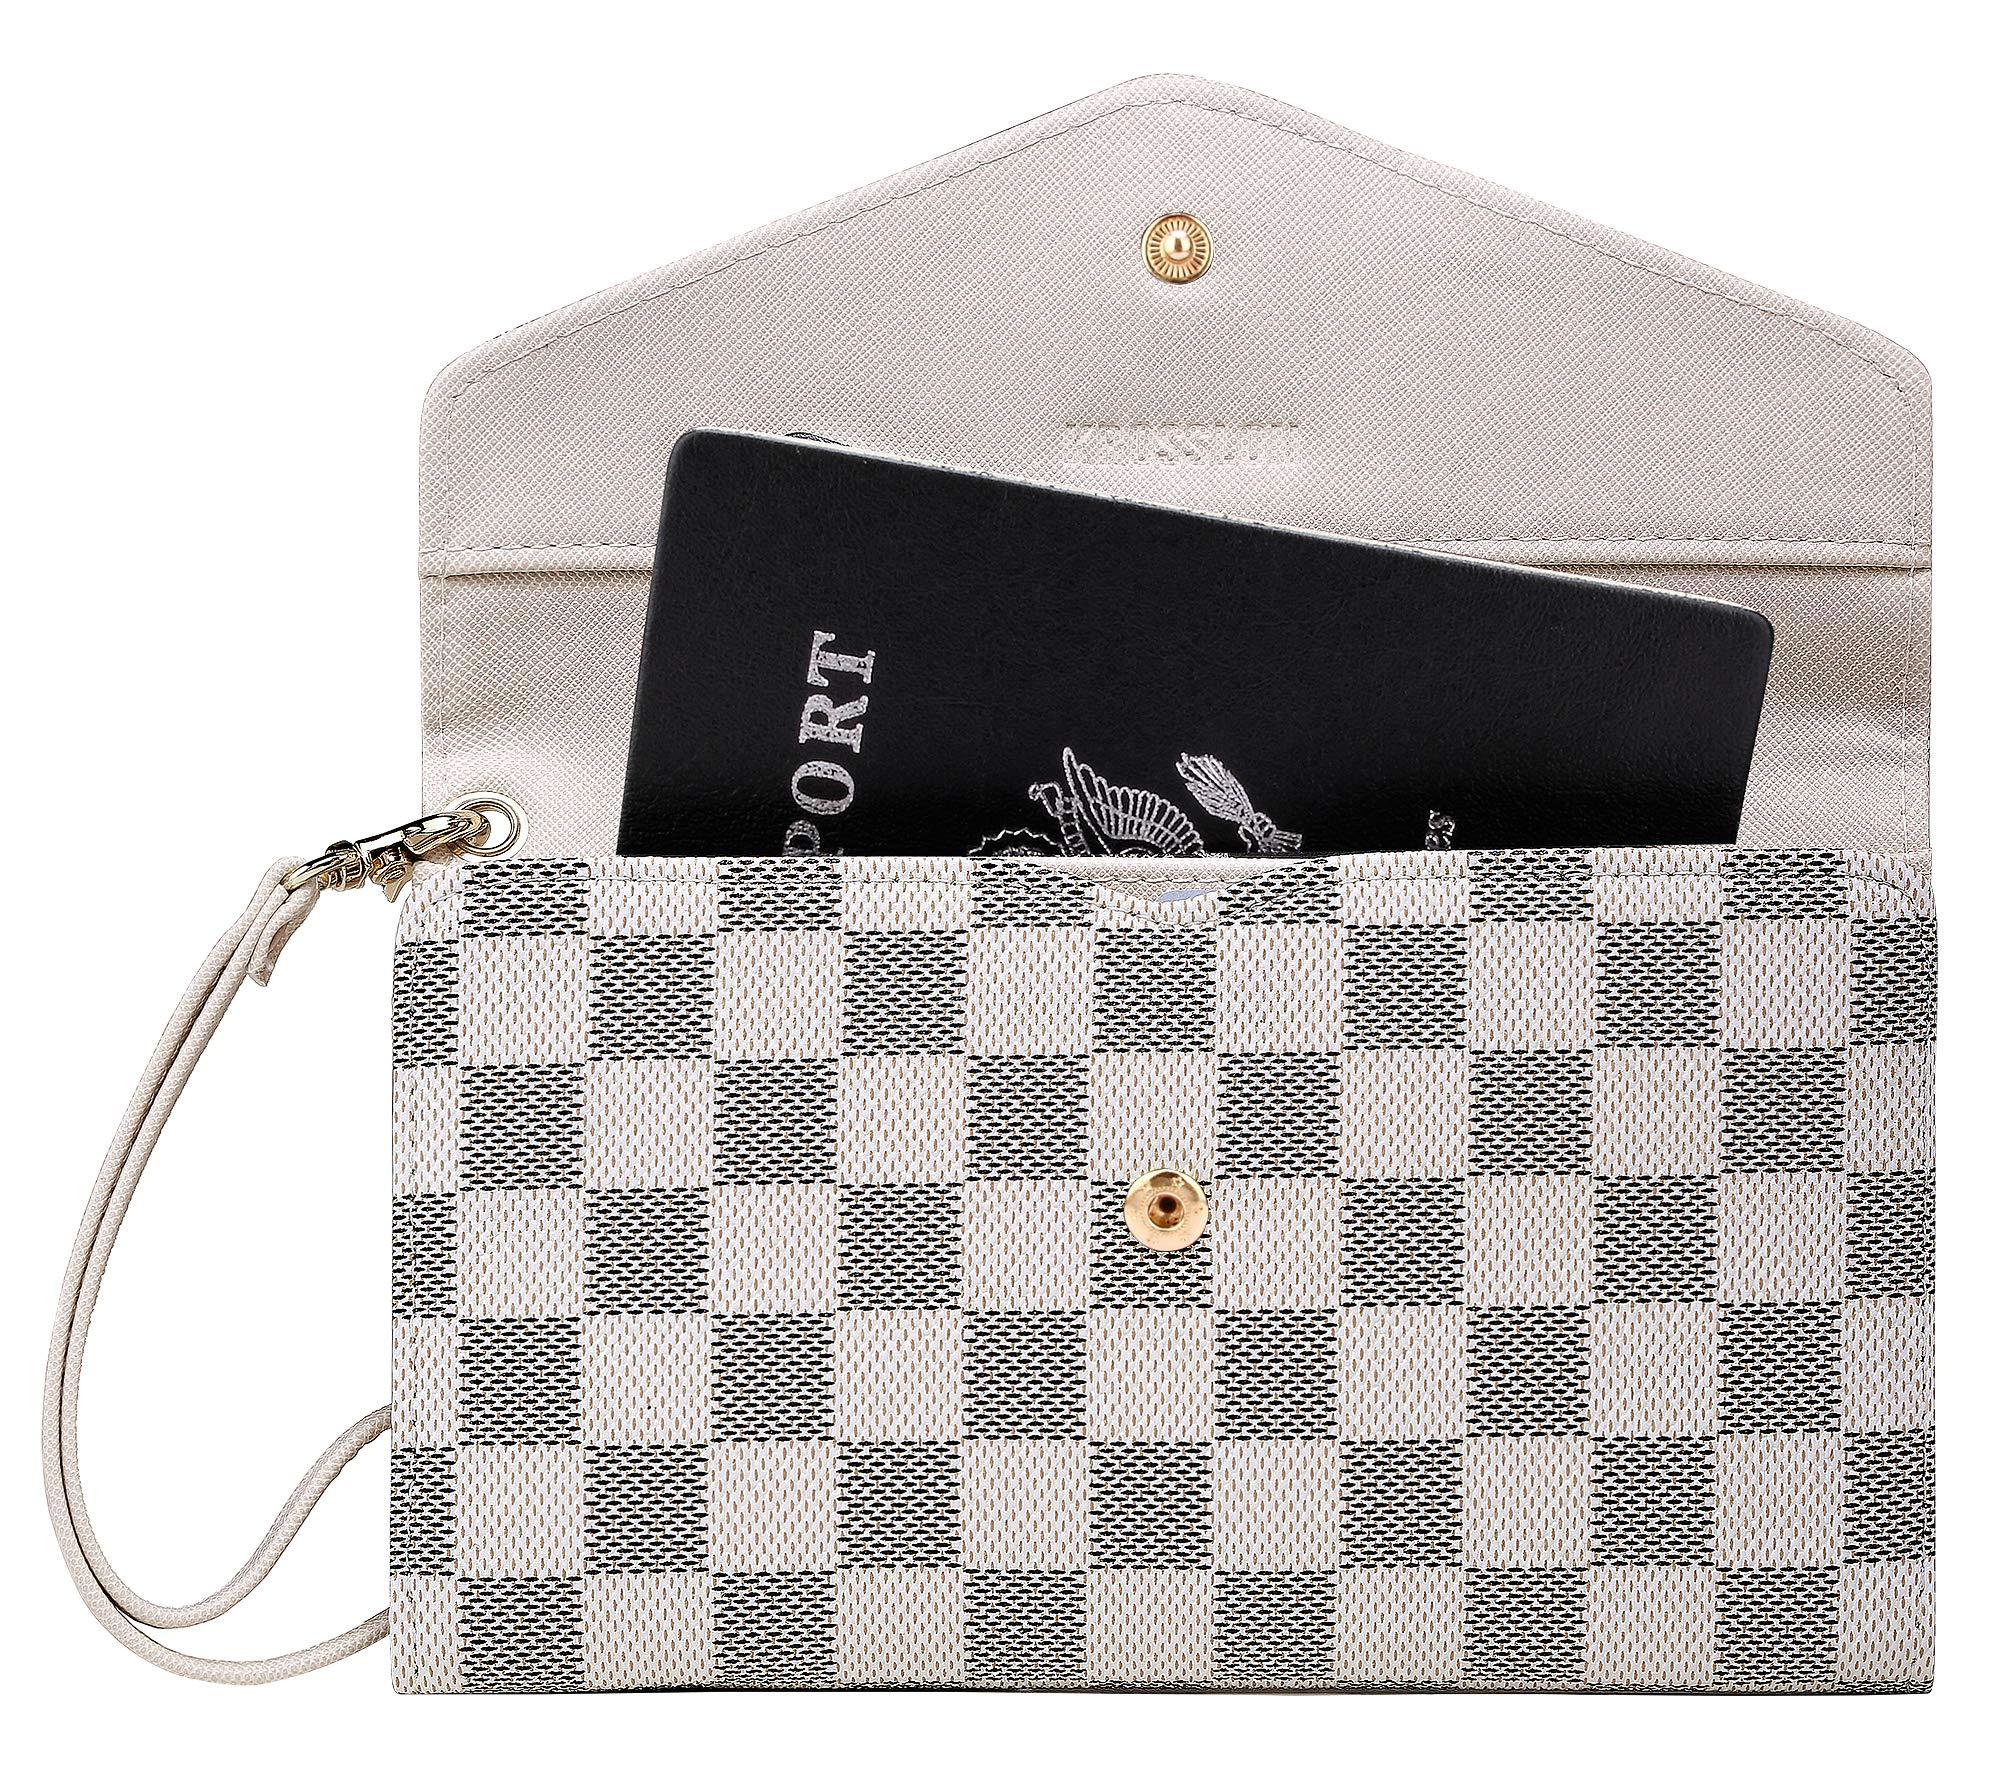 Krosslon Rfid Travel Passport Wallet for Women Slim Holder Wristlet Document Organizer (14# White Checker)